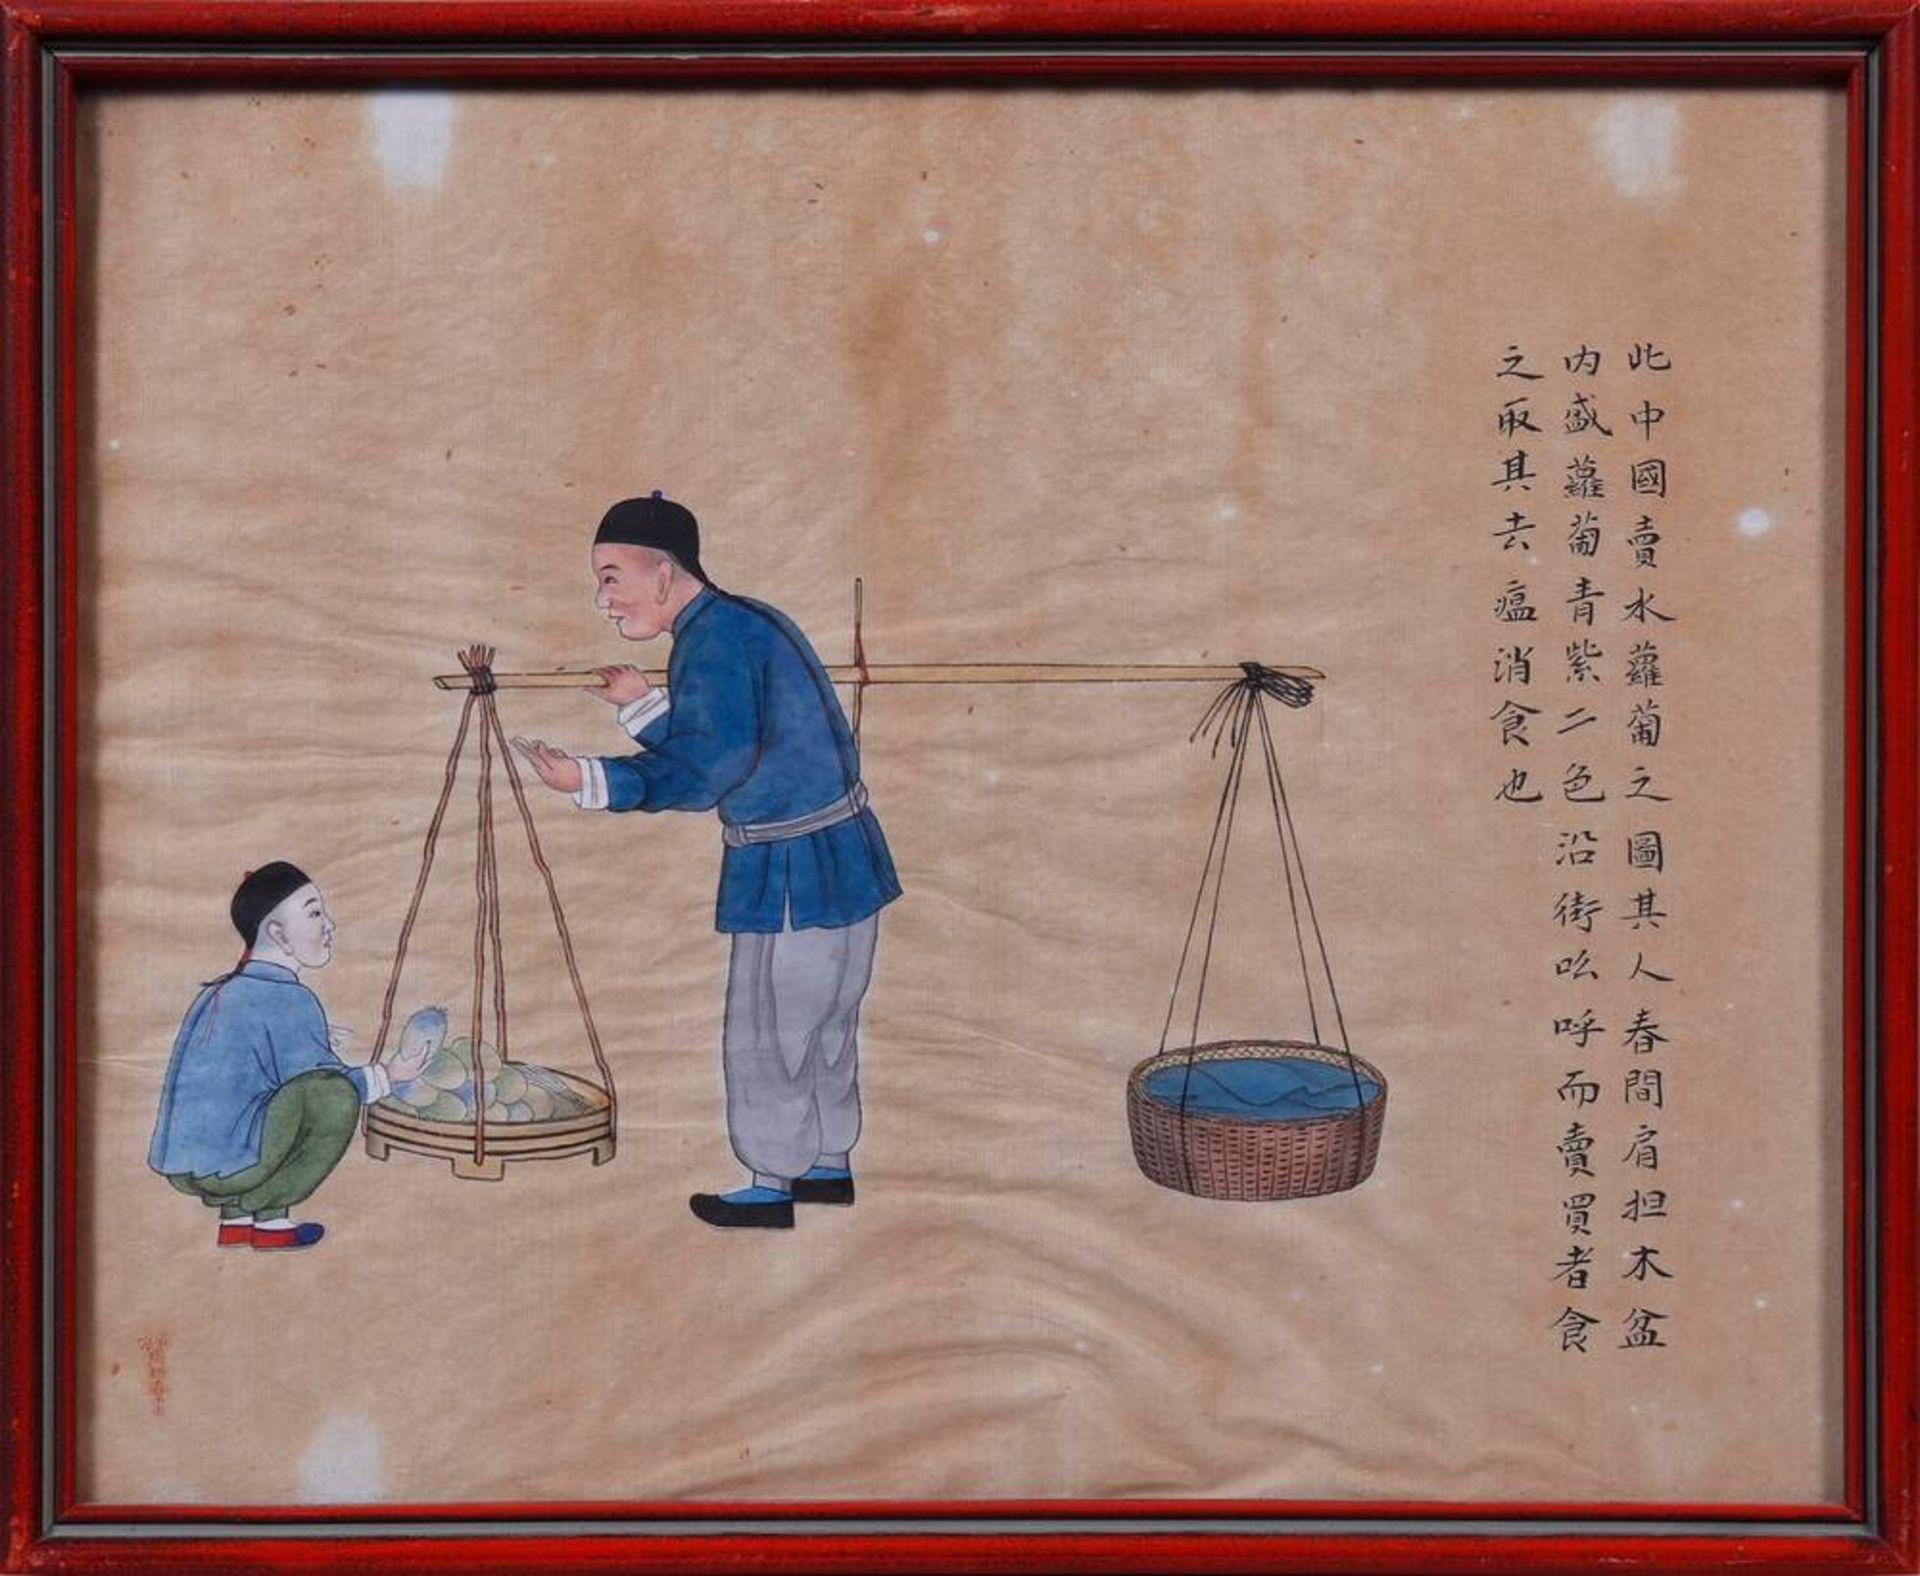 Zhou Peichun (China, tätig Ende 19.Jh./Anfang 20.Jh.) - Image 5 of 5